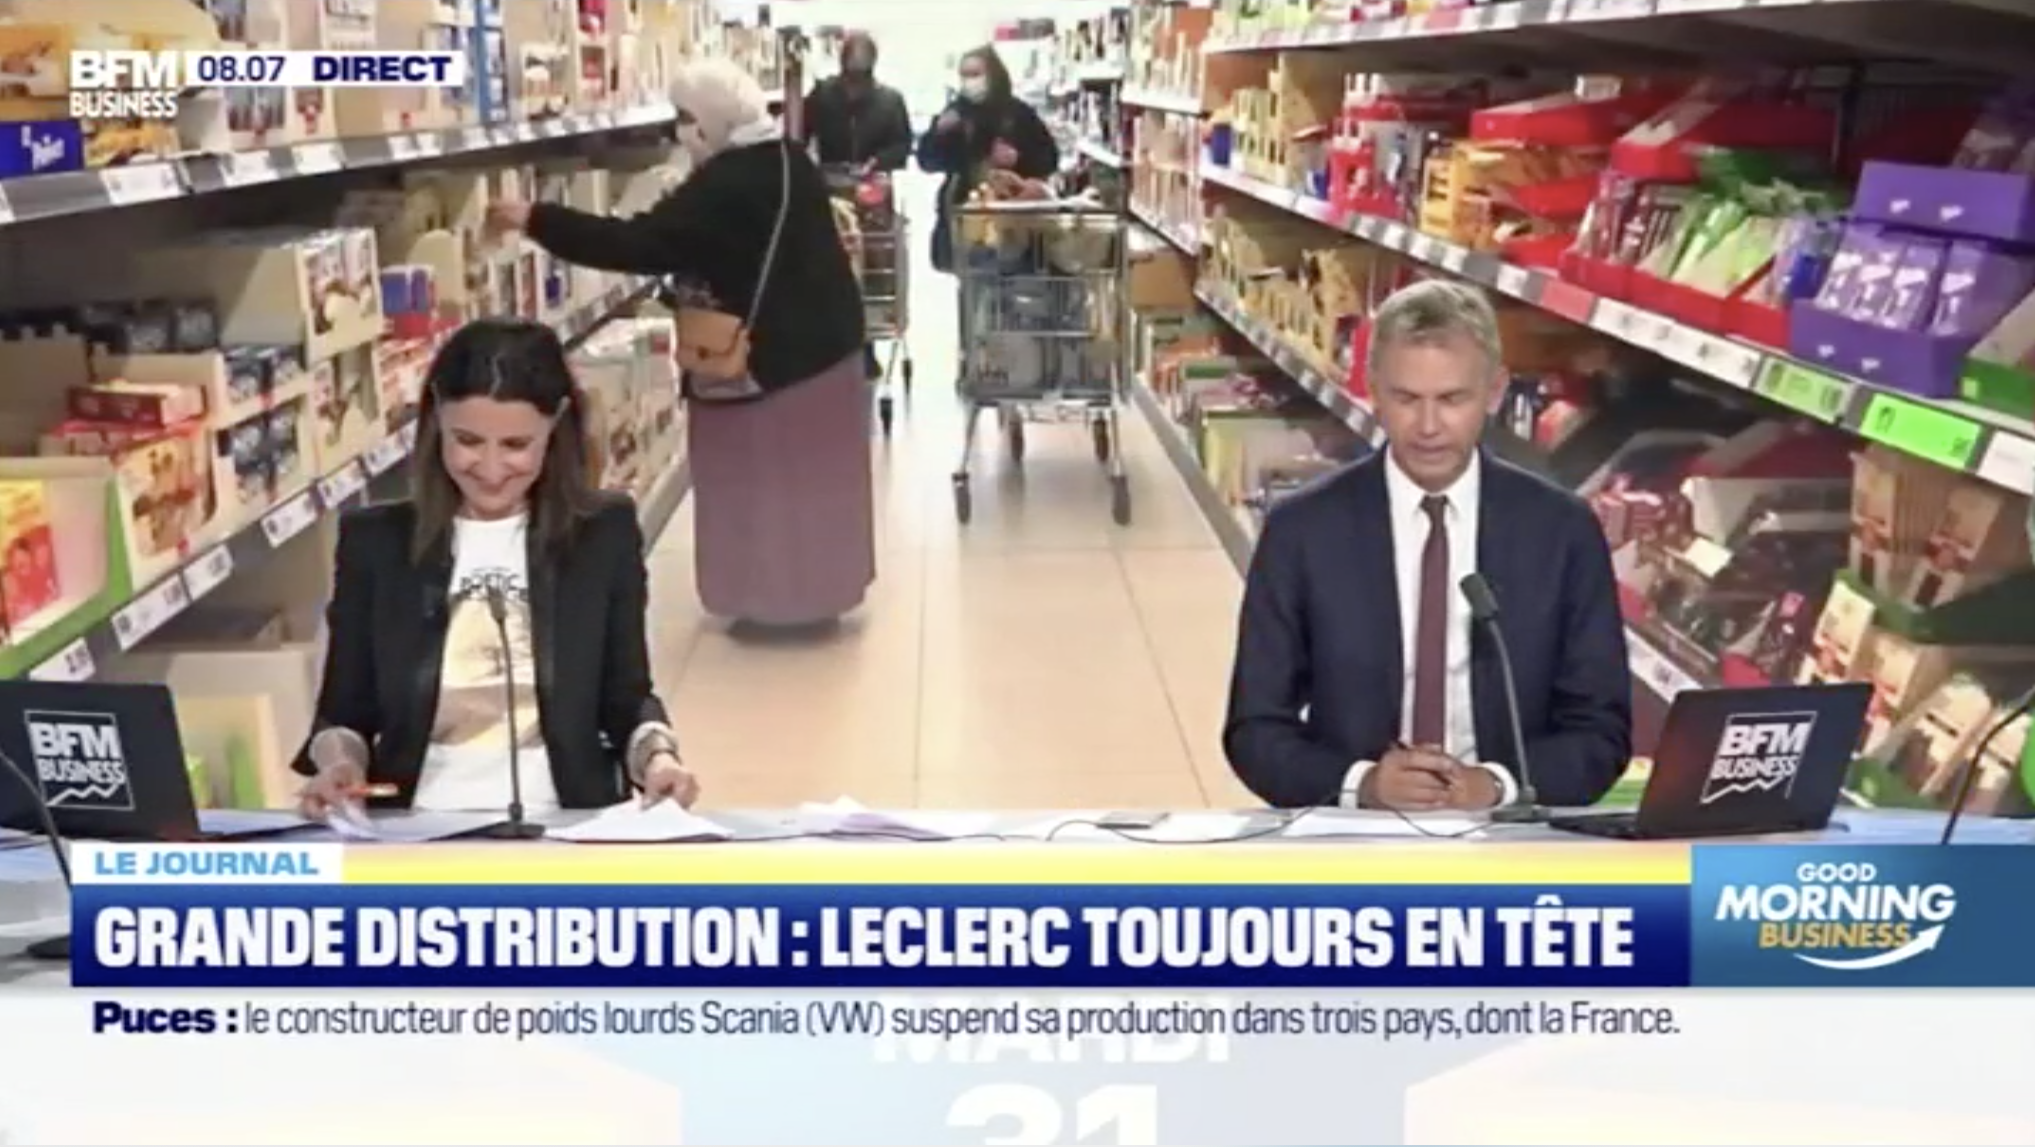 Grande distribution: Leclerc, toujours en tête